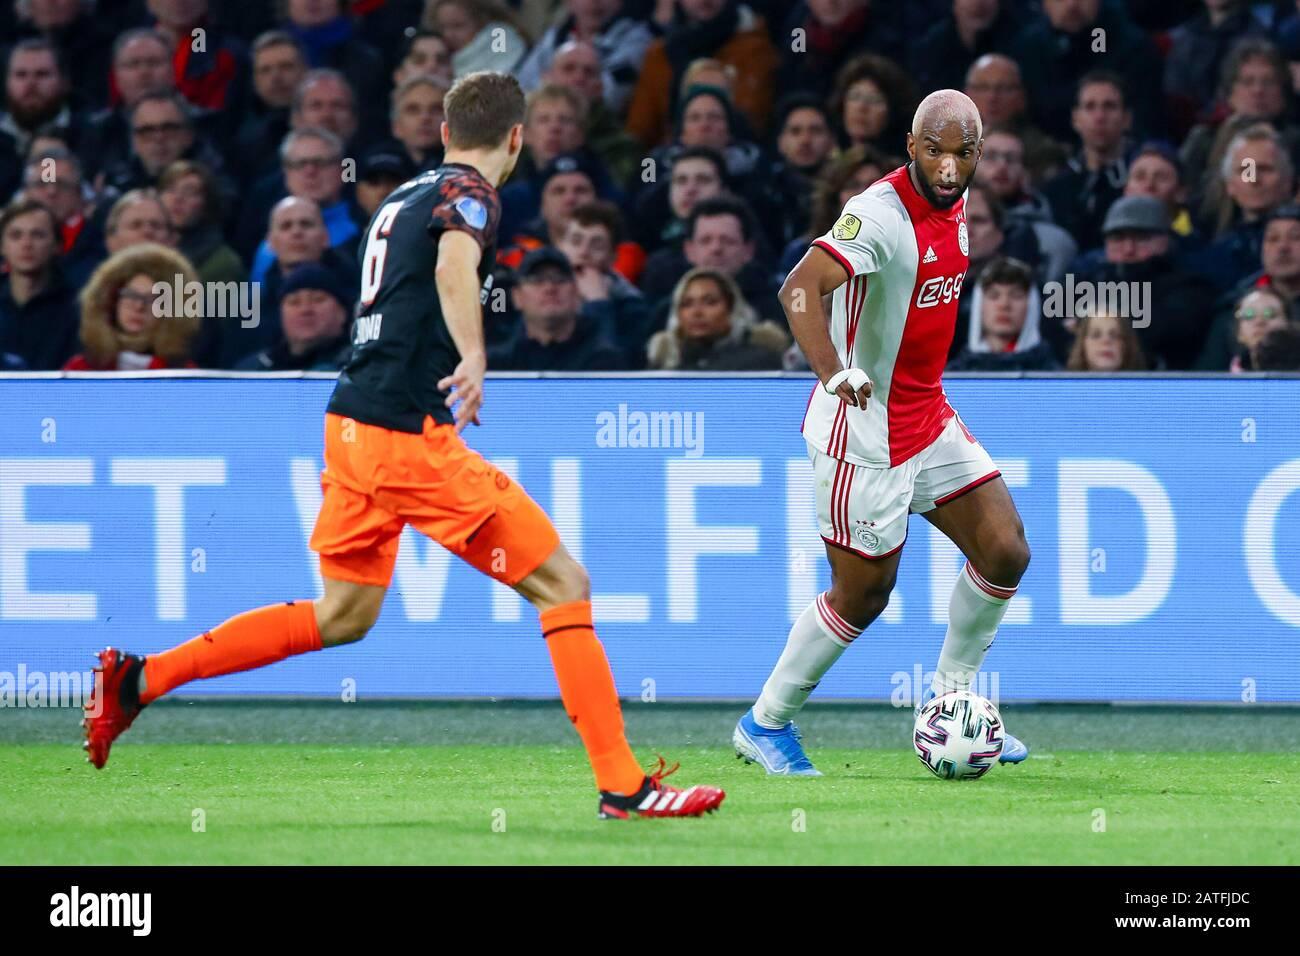 2 February 2020 Amsterdam The Netherlands Soccer Ajax V Psv Eredivisie 2019 2020 Daniel Schwaab Of Psv Eindhoven Ryan Babel Of Ajax Stock Photo Alamy